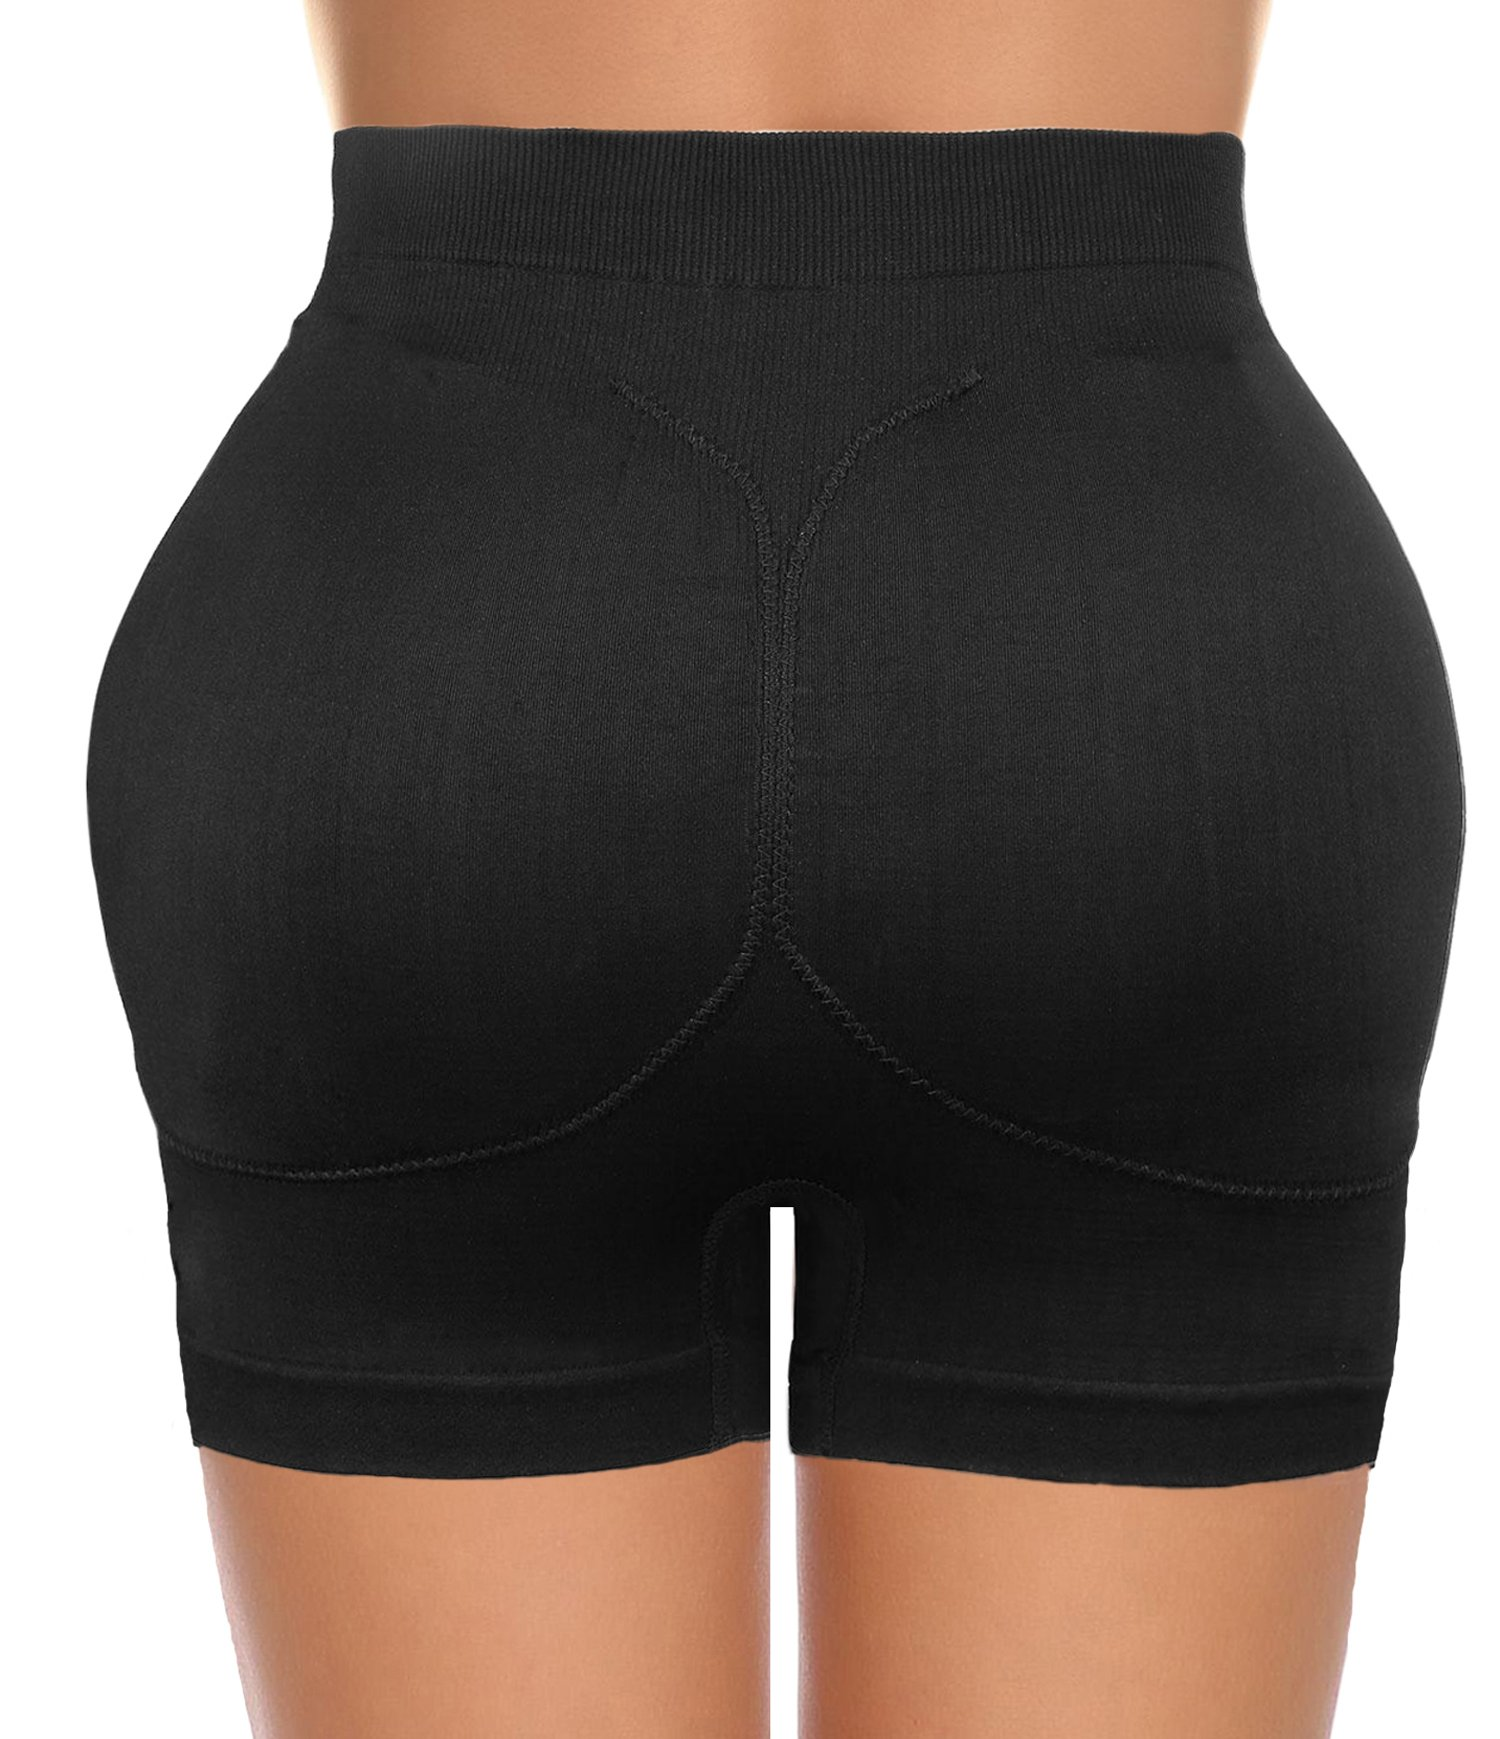 CeesyJuly Womens Hip Enhancer Butt Lifter Padded Waist Girdle Control Panties